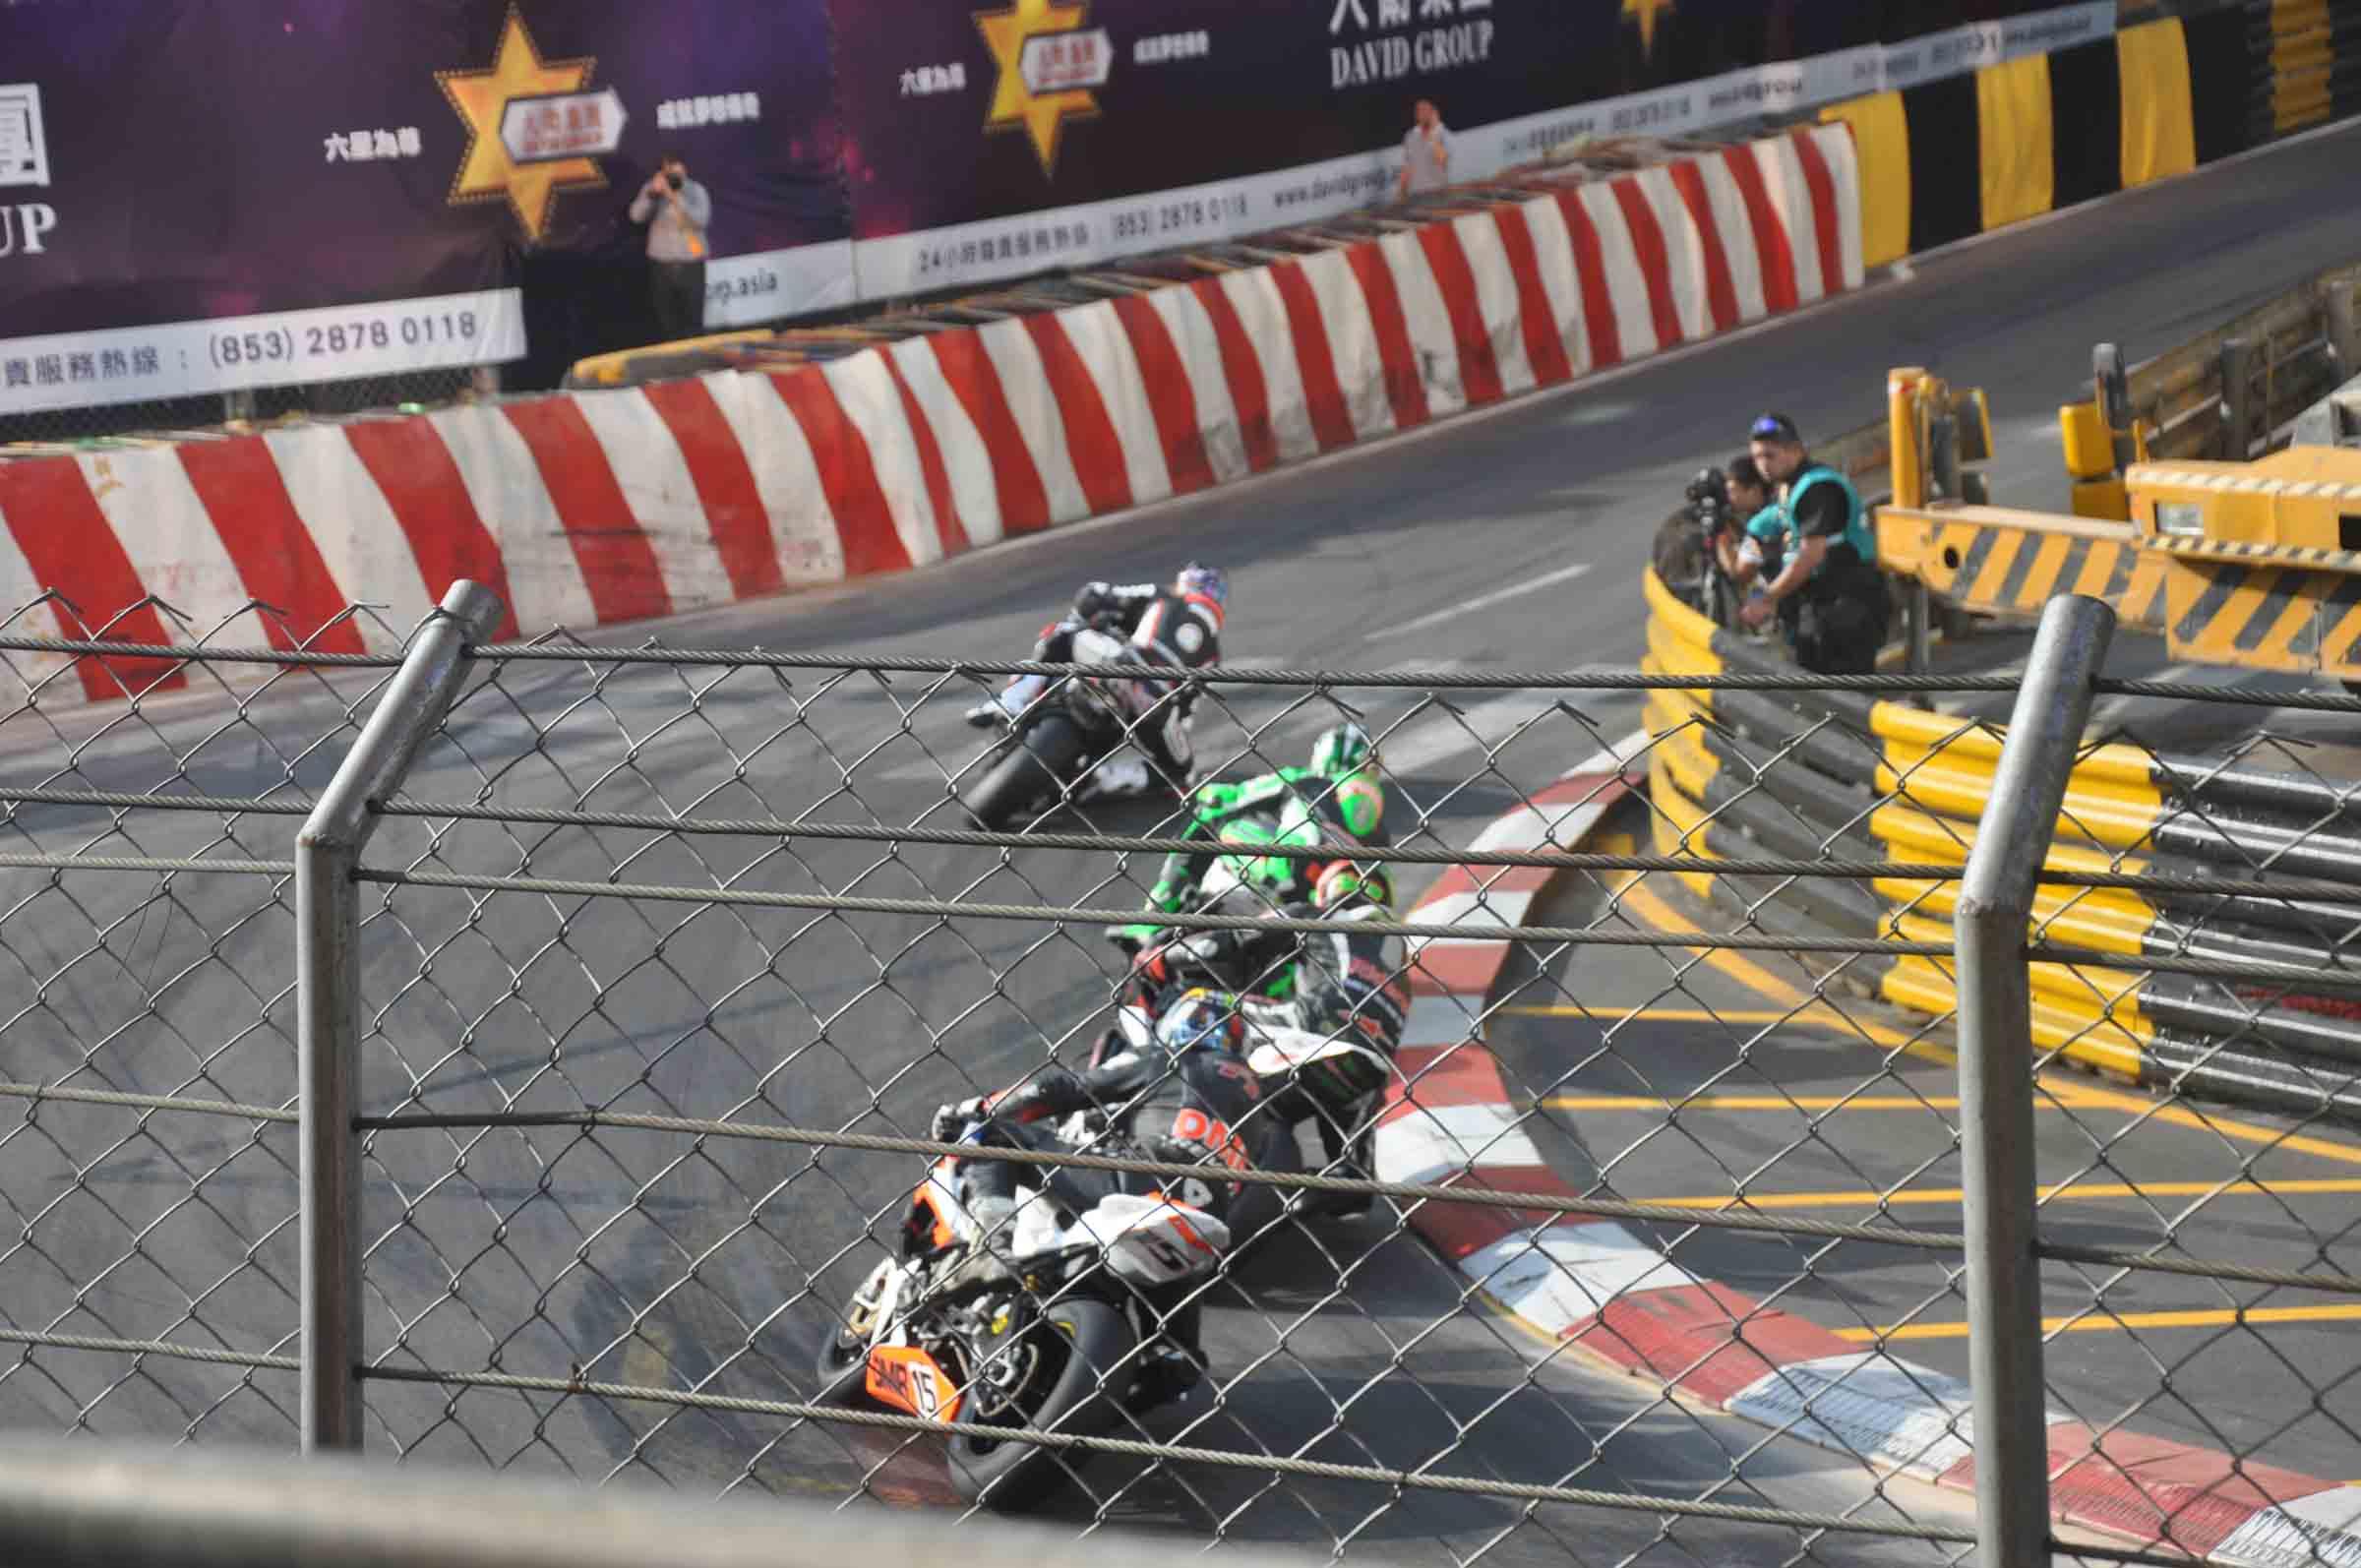 Macau F3 Grand Prix Qualifying Race motorcycle race